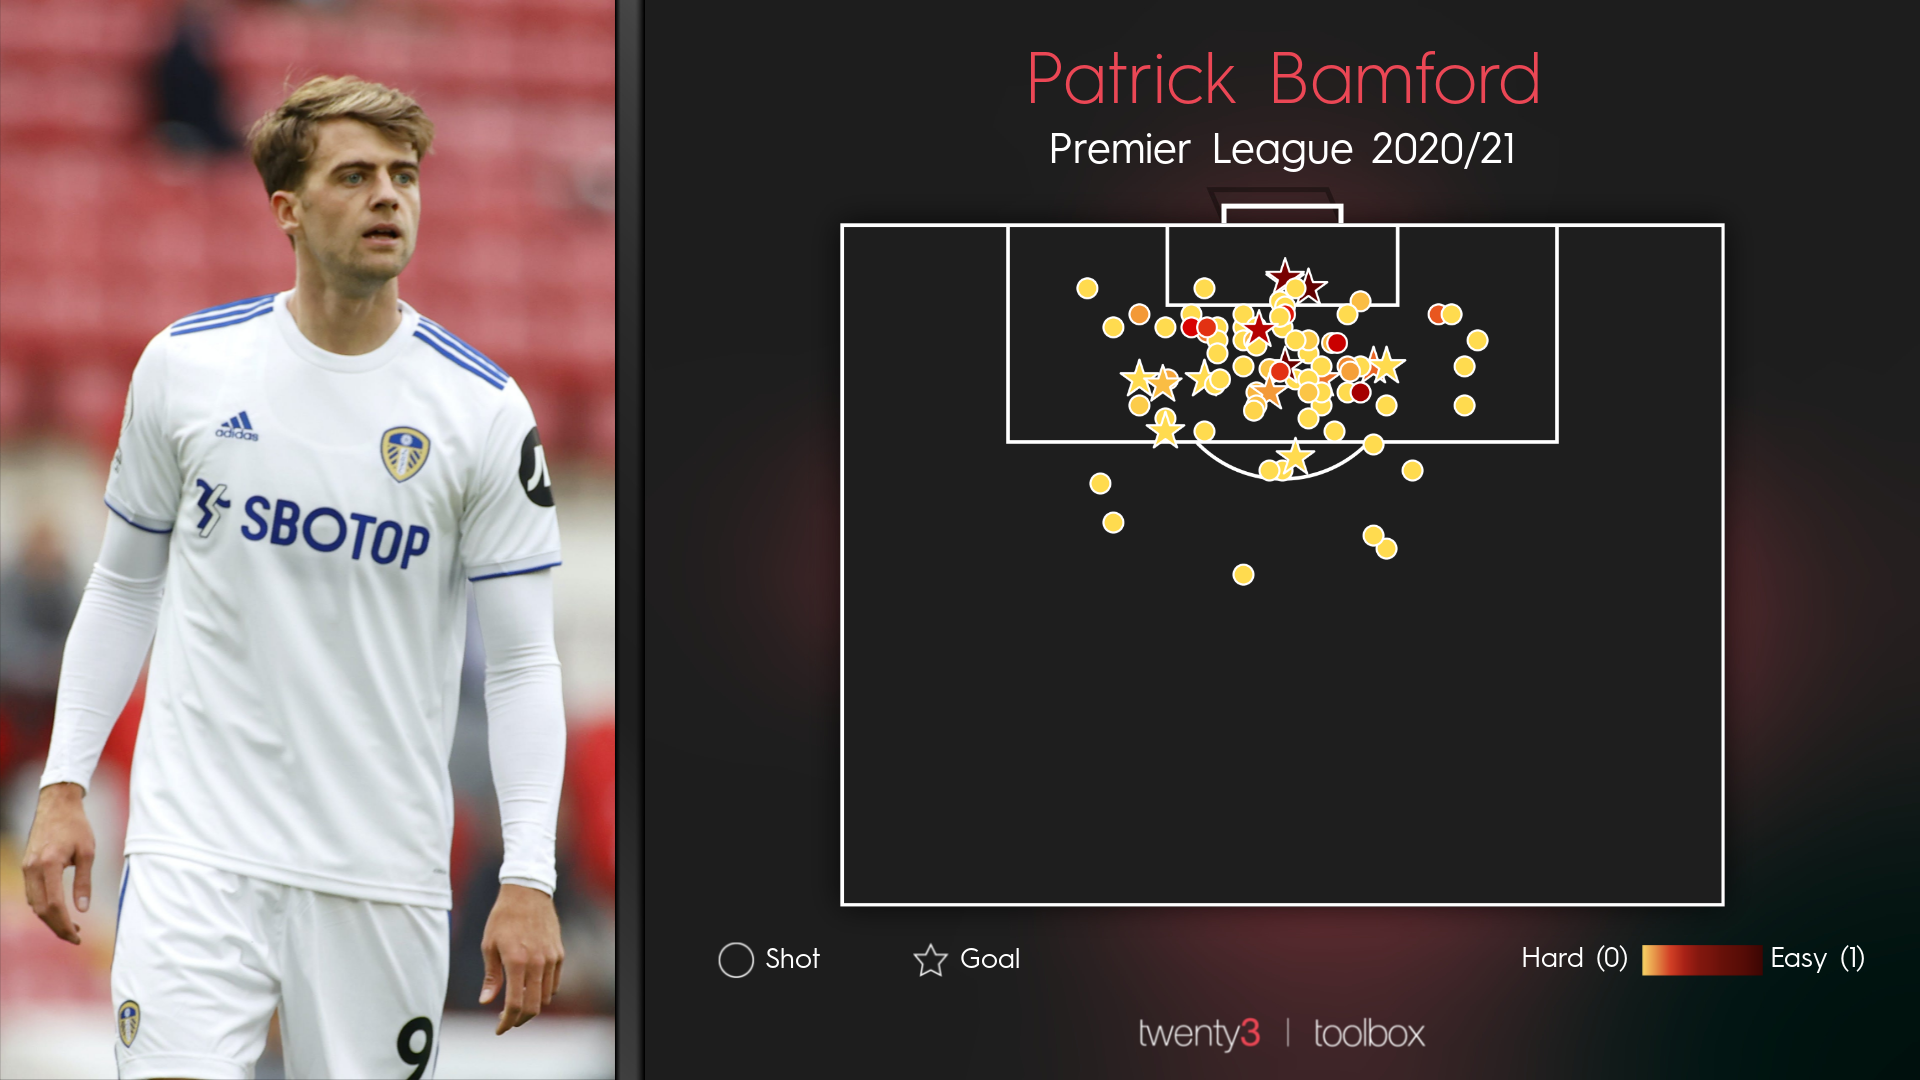 Patrick Bamford's Premier League shot map for 2020/21.